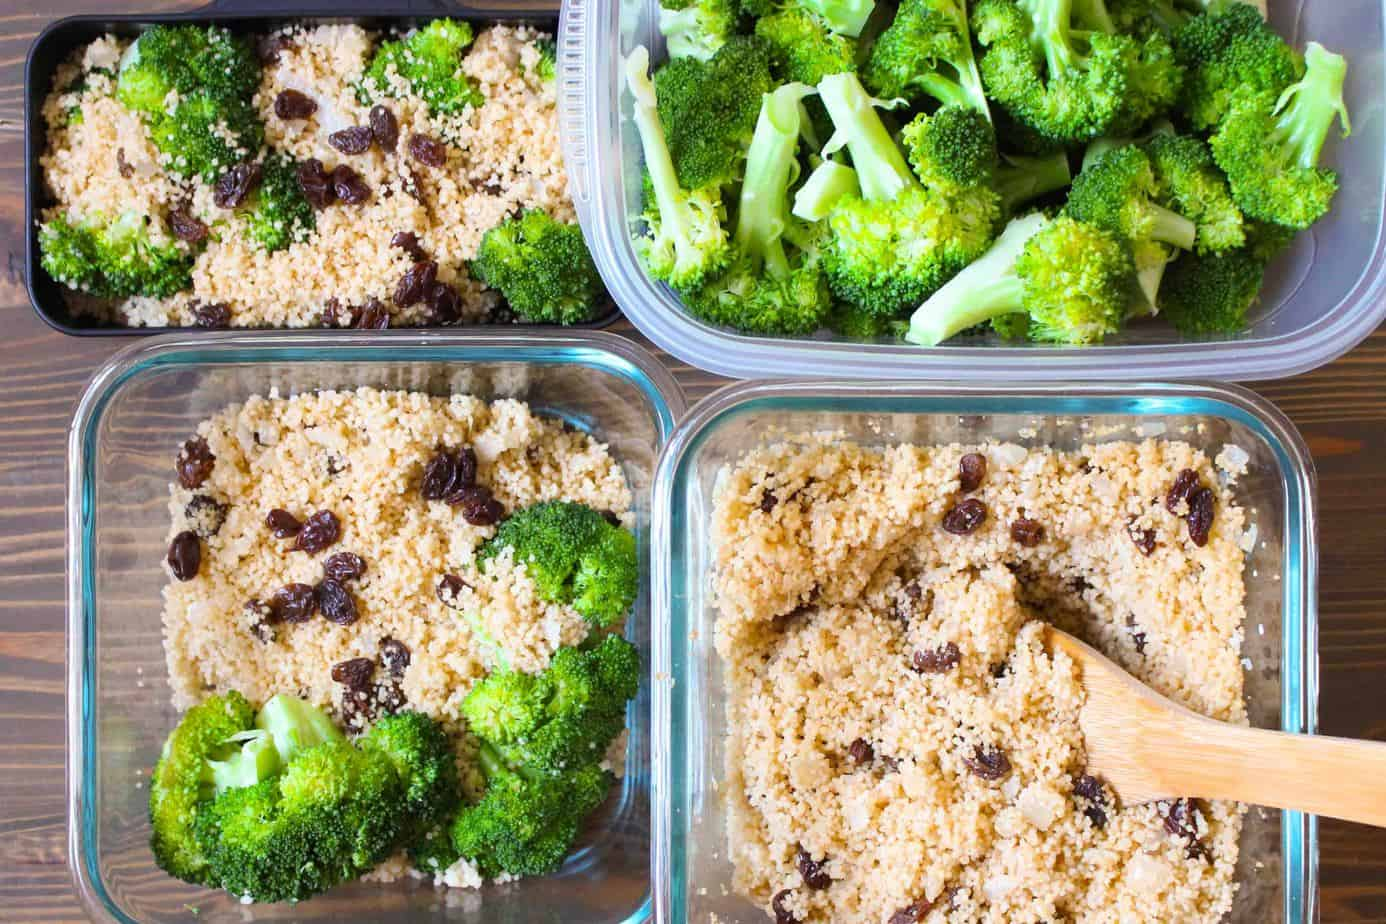 Spiced Couscous & Raisins Meal Prep | Frugal Nutrition #mealprep